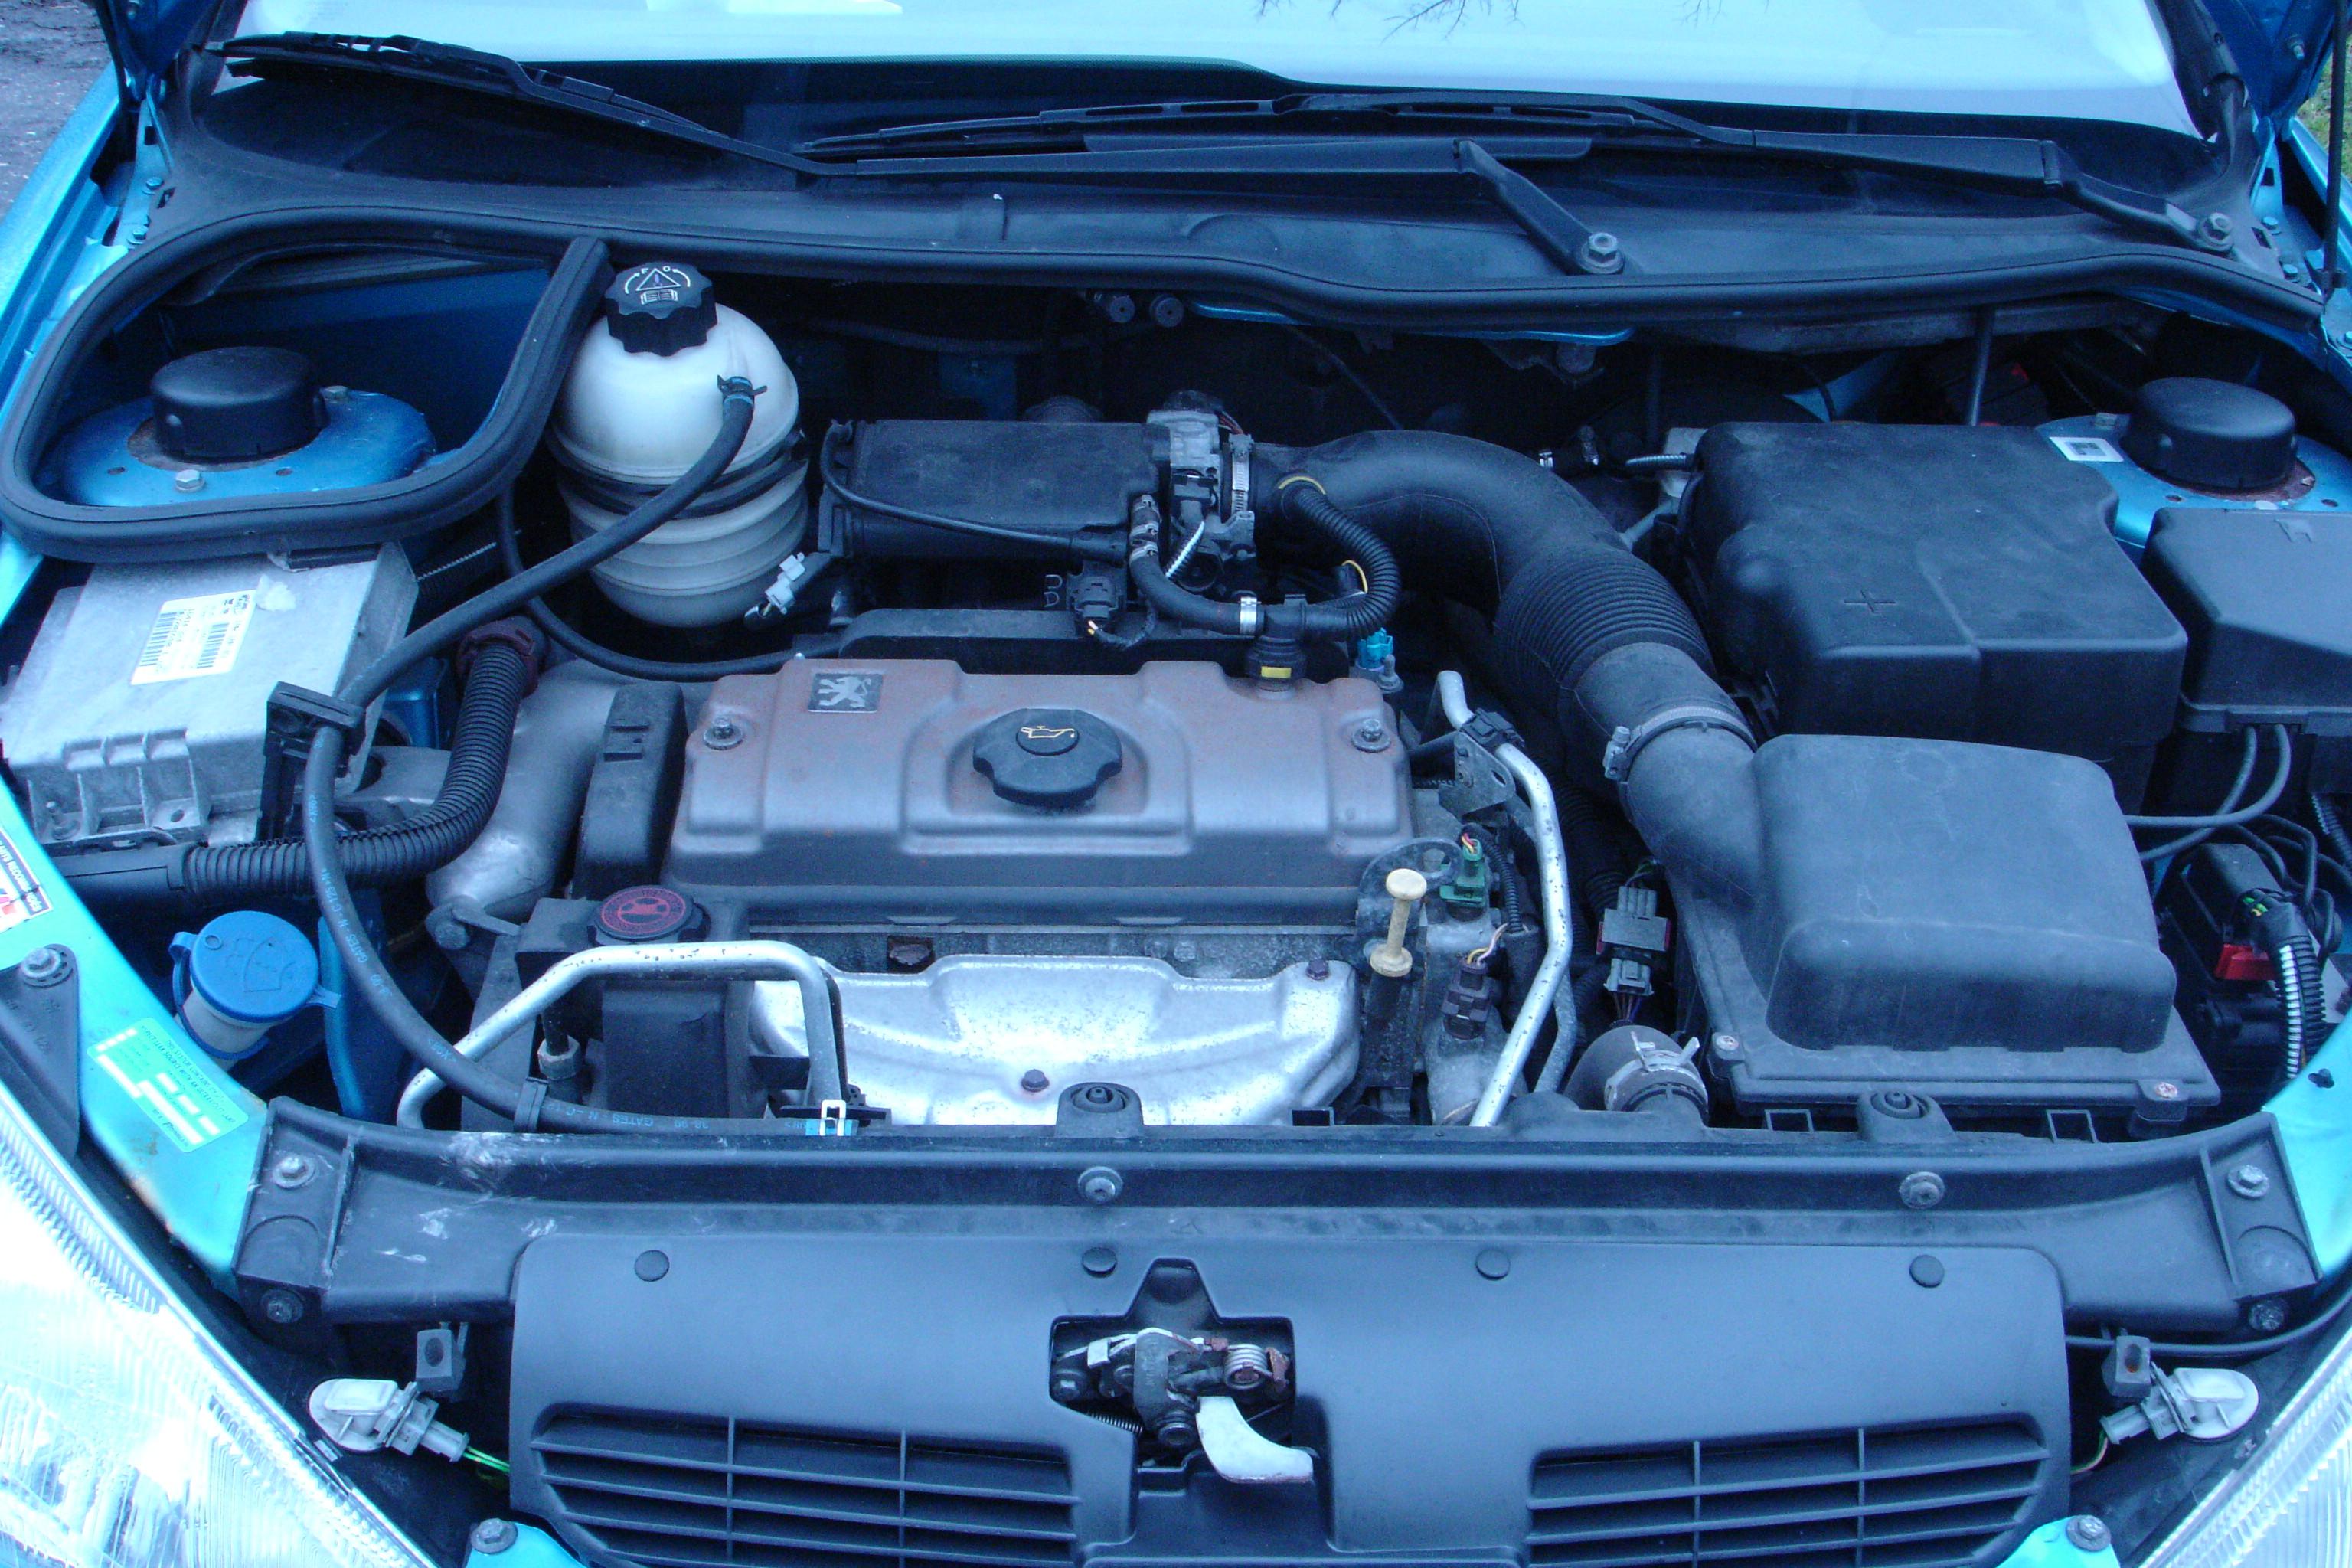 File:Peugeot 206 1999 Hatchback 1.1 TU1JP(HFZ) 06.JPG